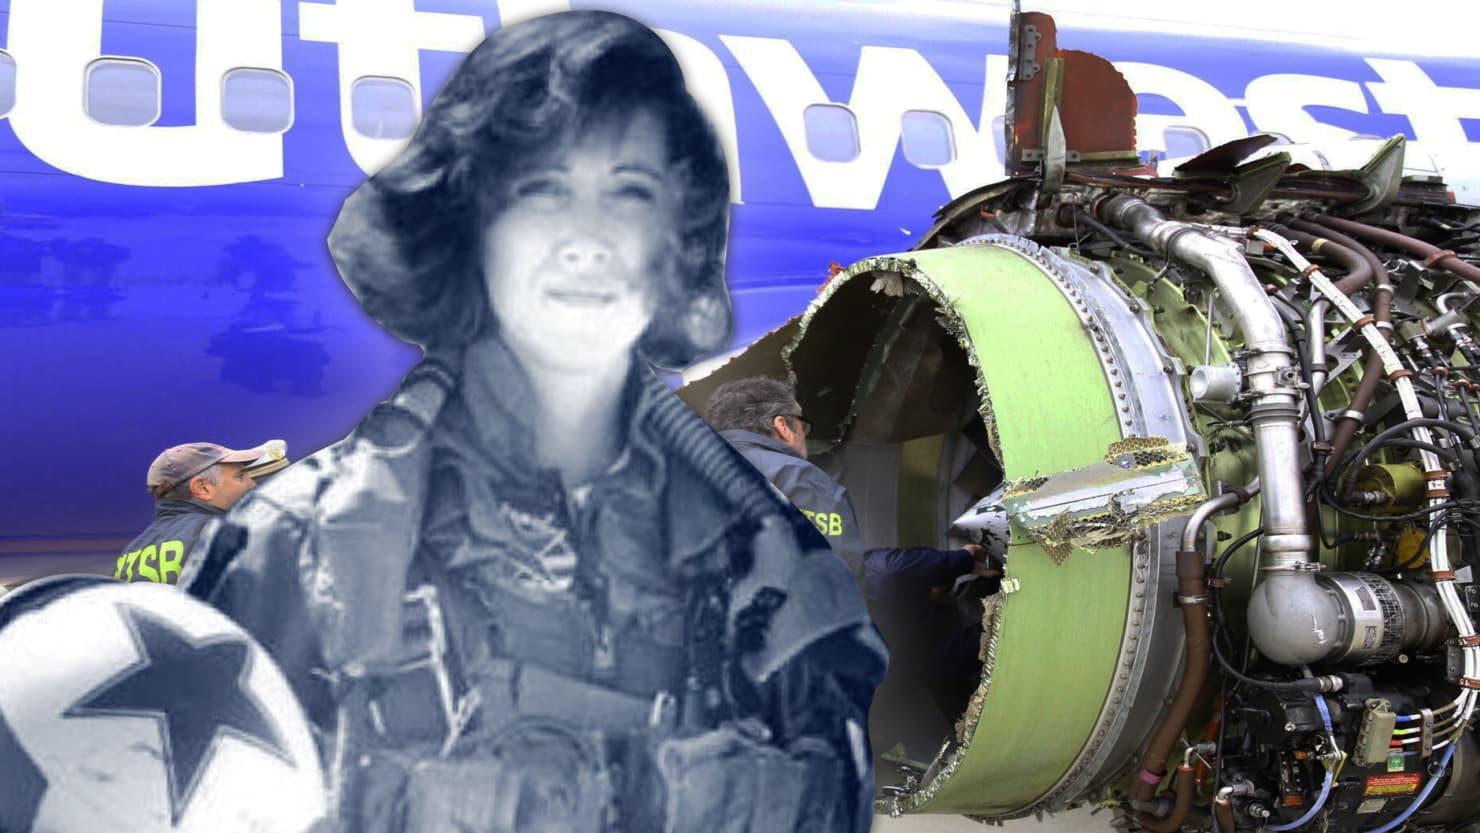 Tammie Jo Shults, der var kaptajn på tirsdagens Southwest-flyvning, har en fortid som jagerpilot i US Navy.